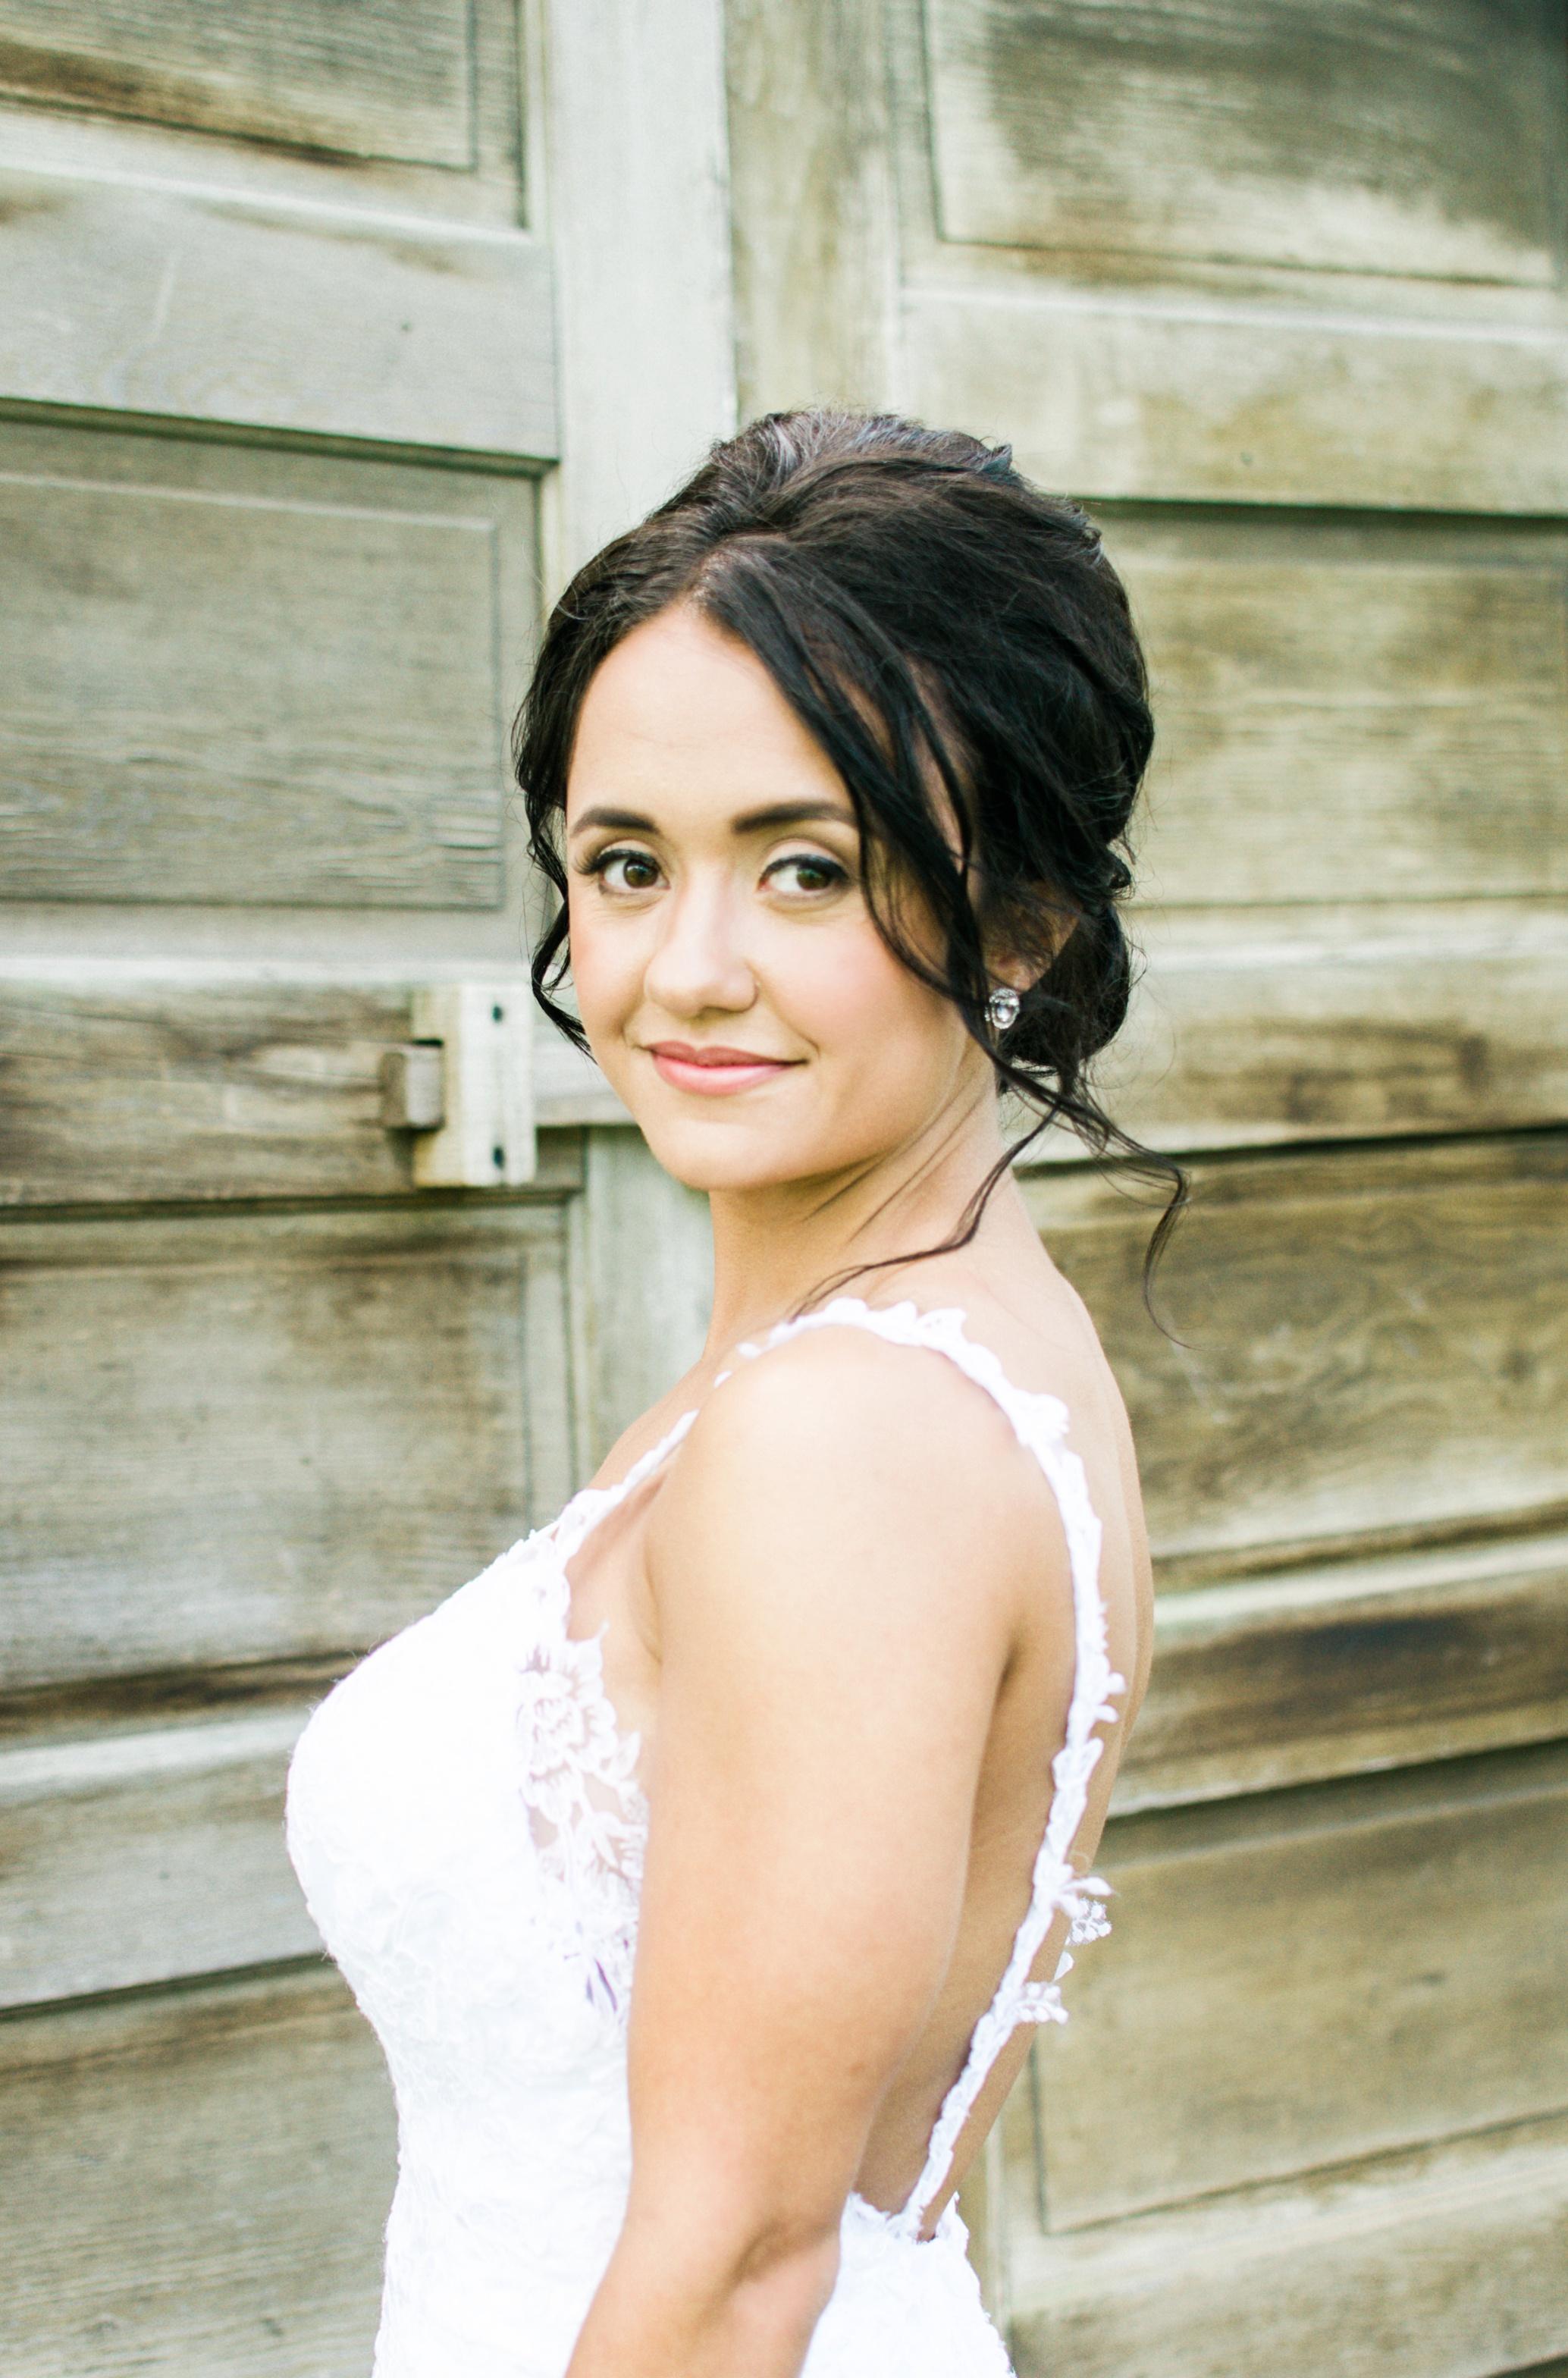 Barnes' Place Rustic Outdoor Wedding | Ali Leigh Photo Minneapolis Wedding Photographer_0108.jpg